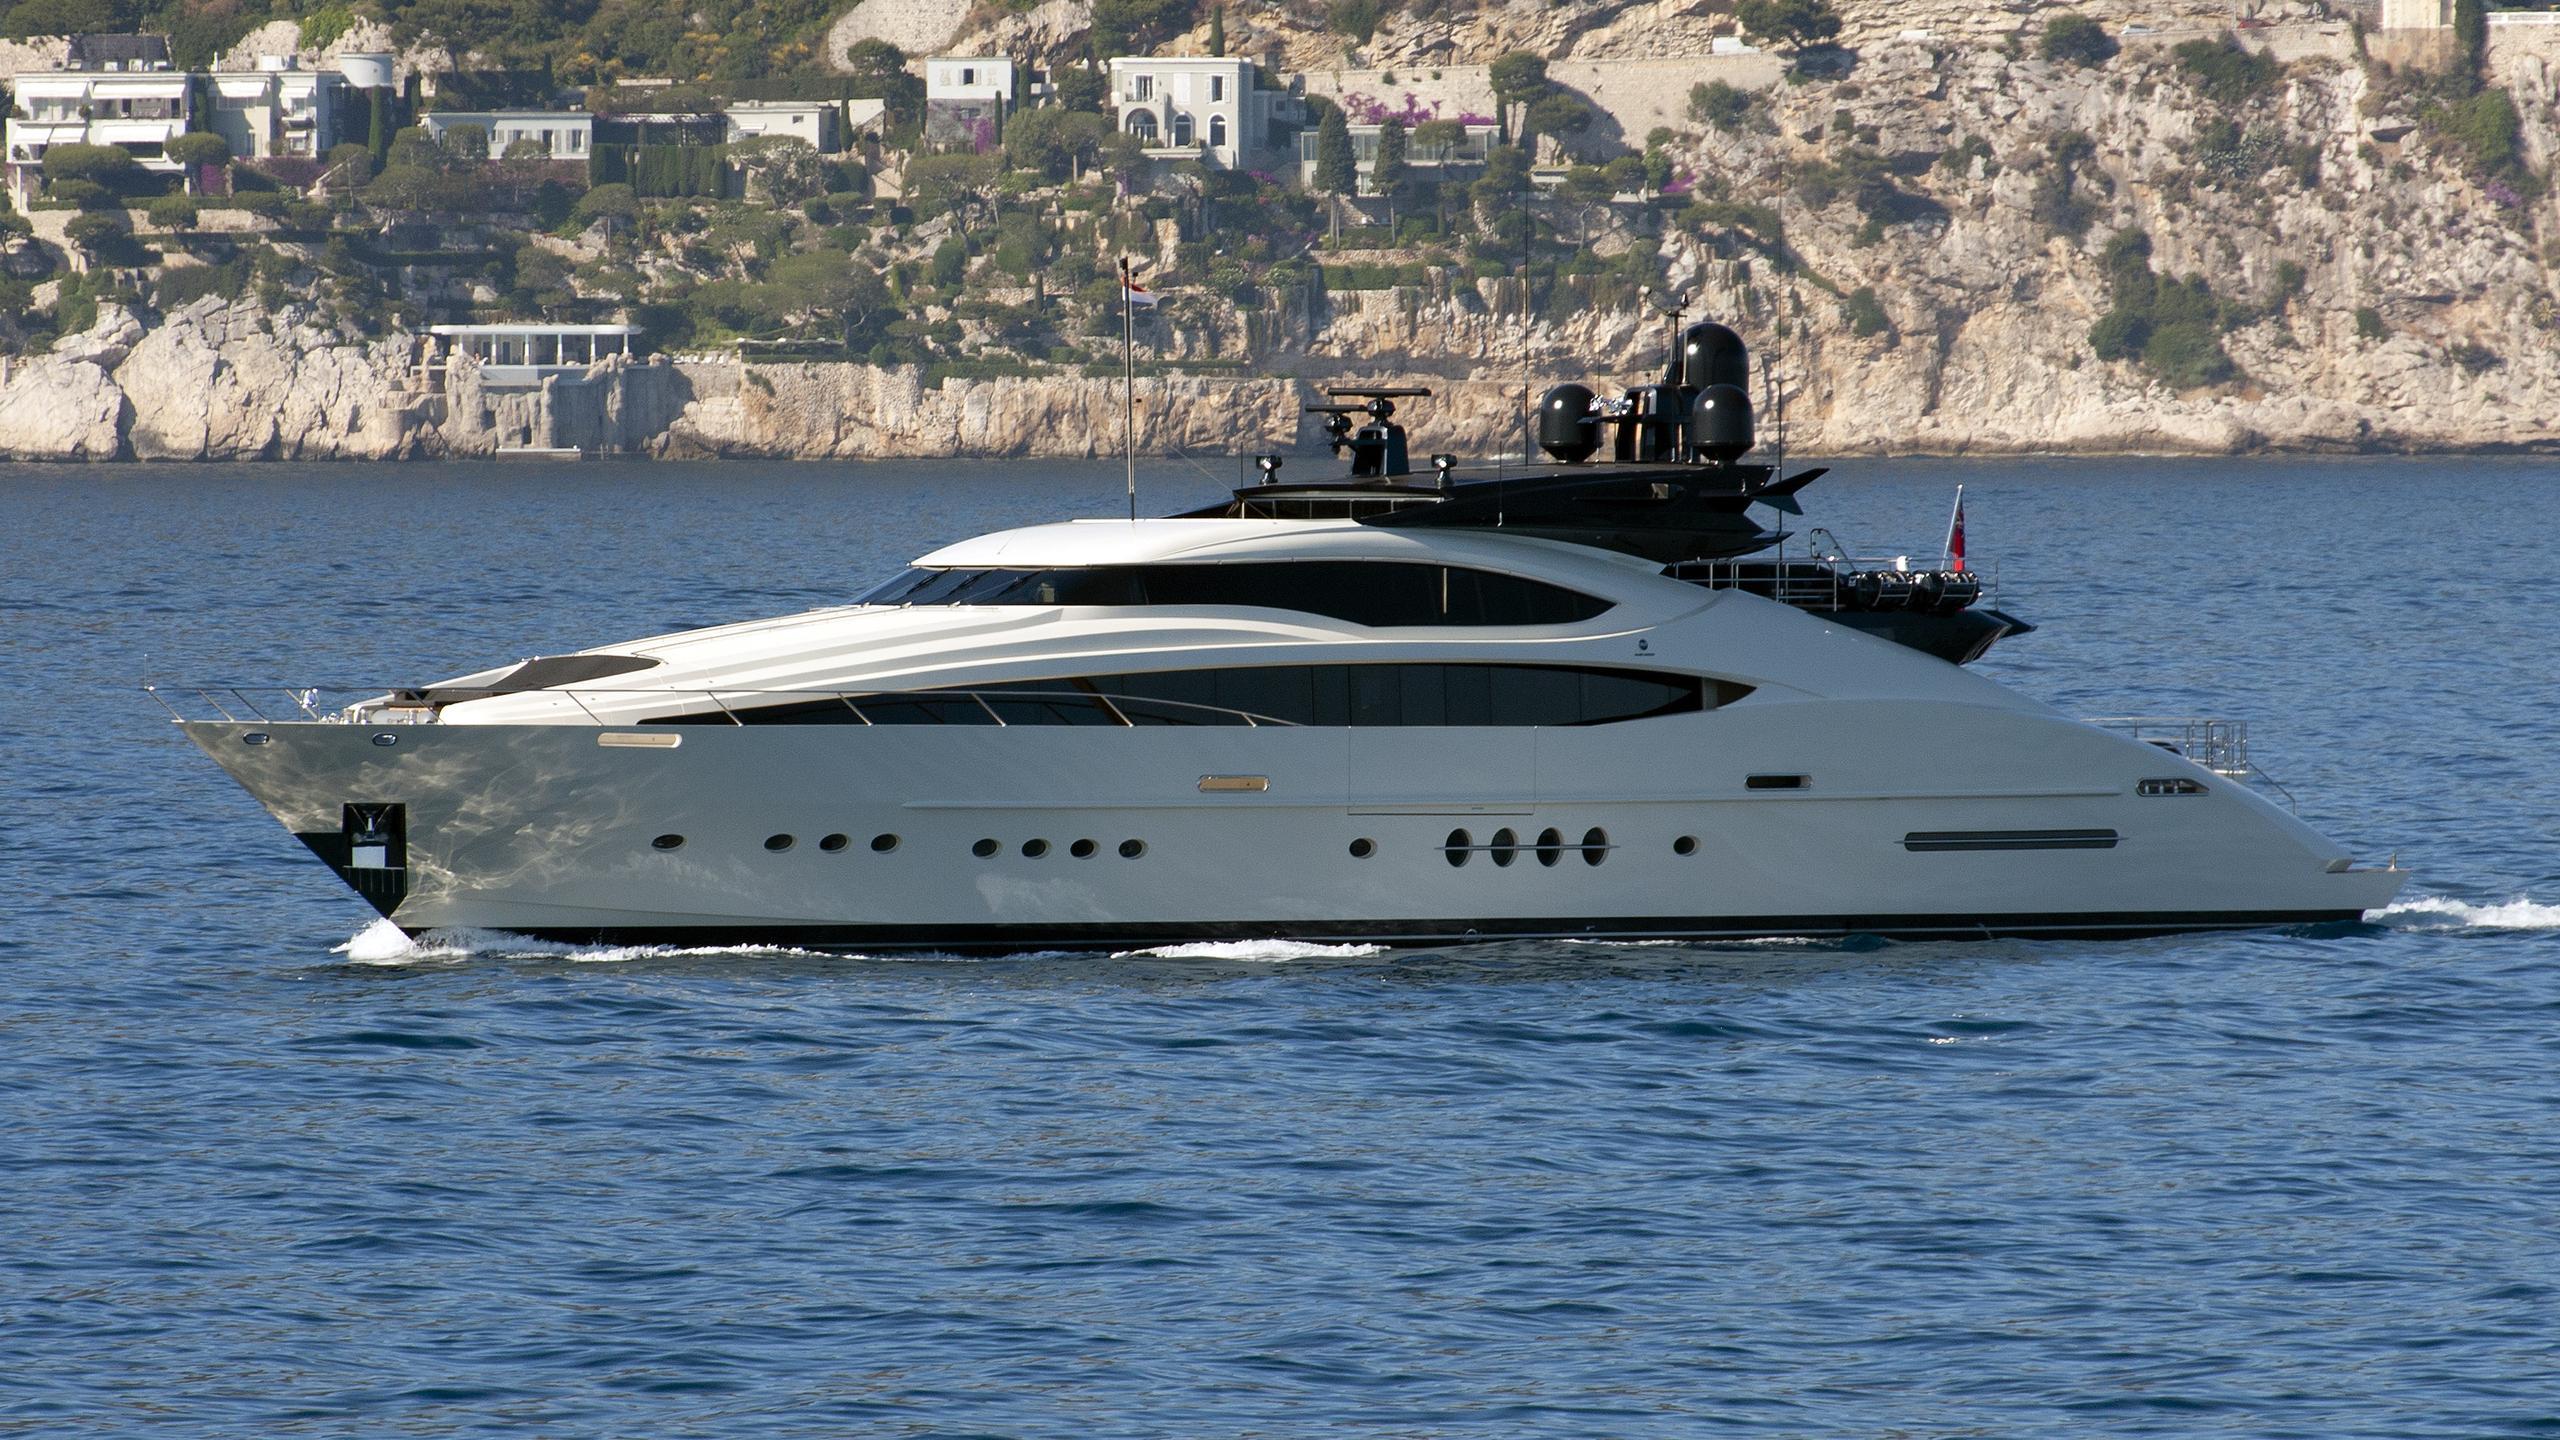 vantage-yacht-exterior